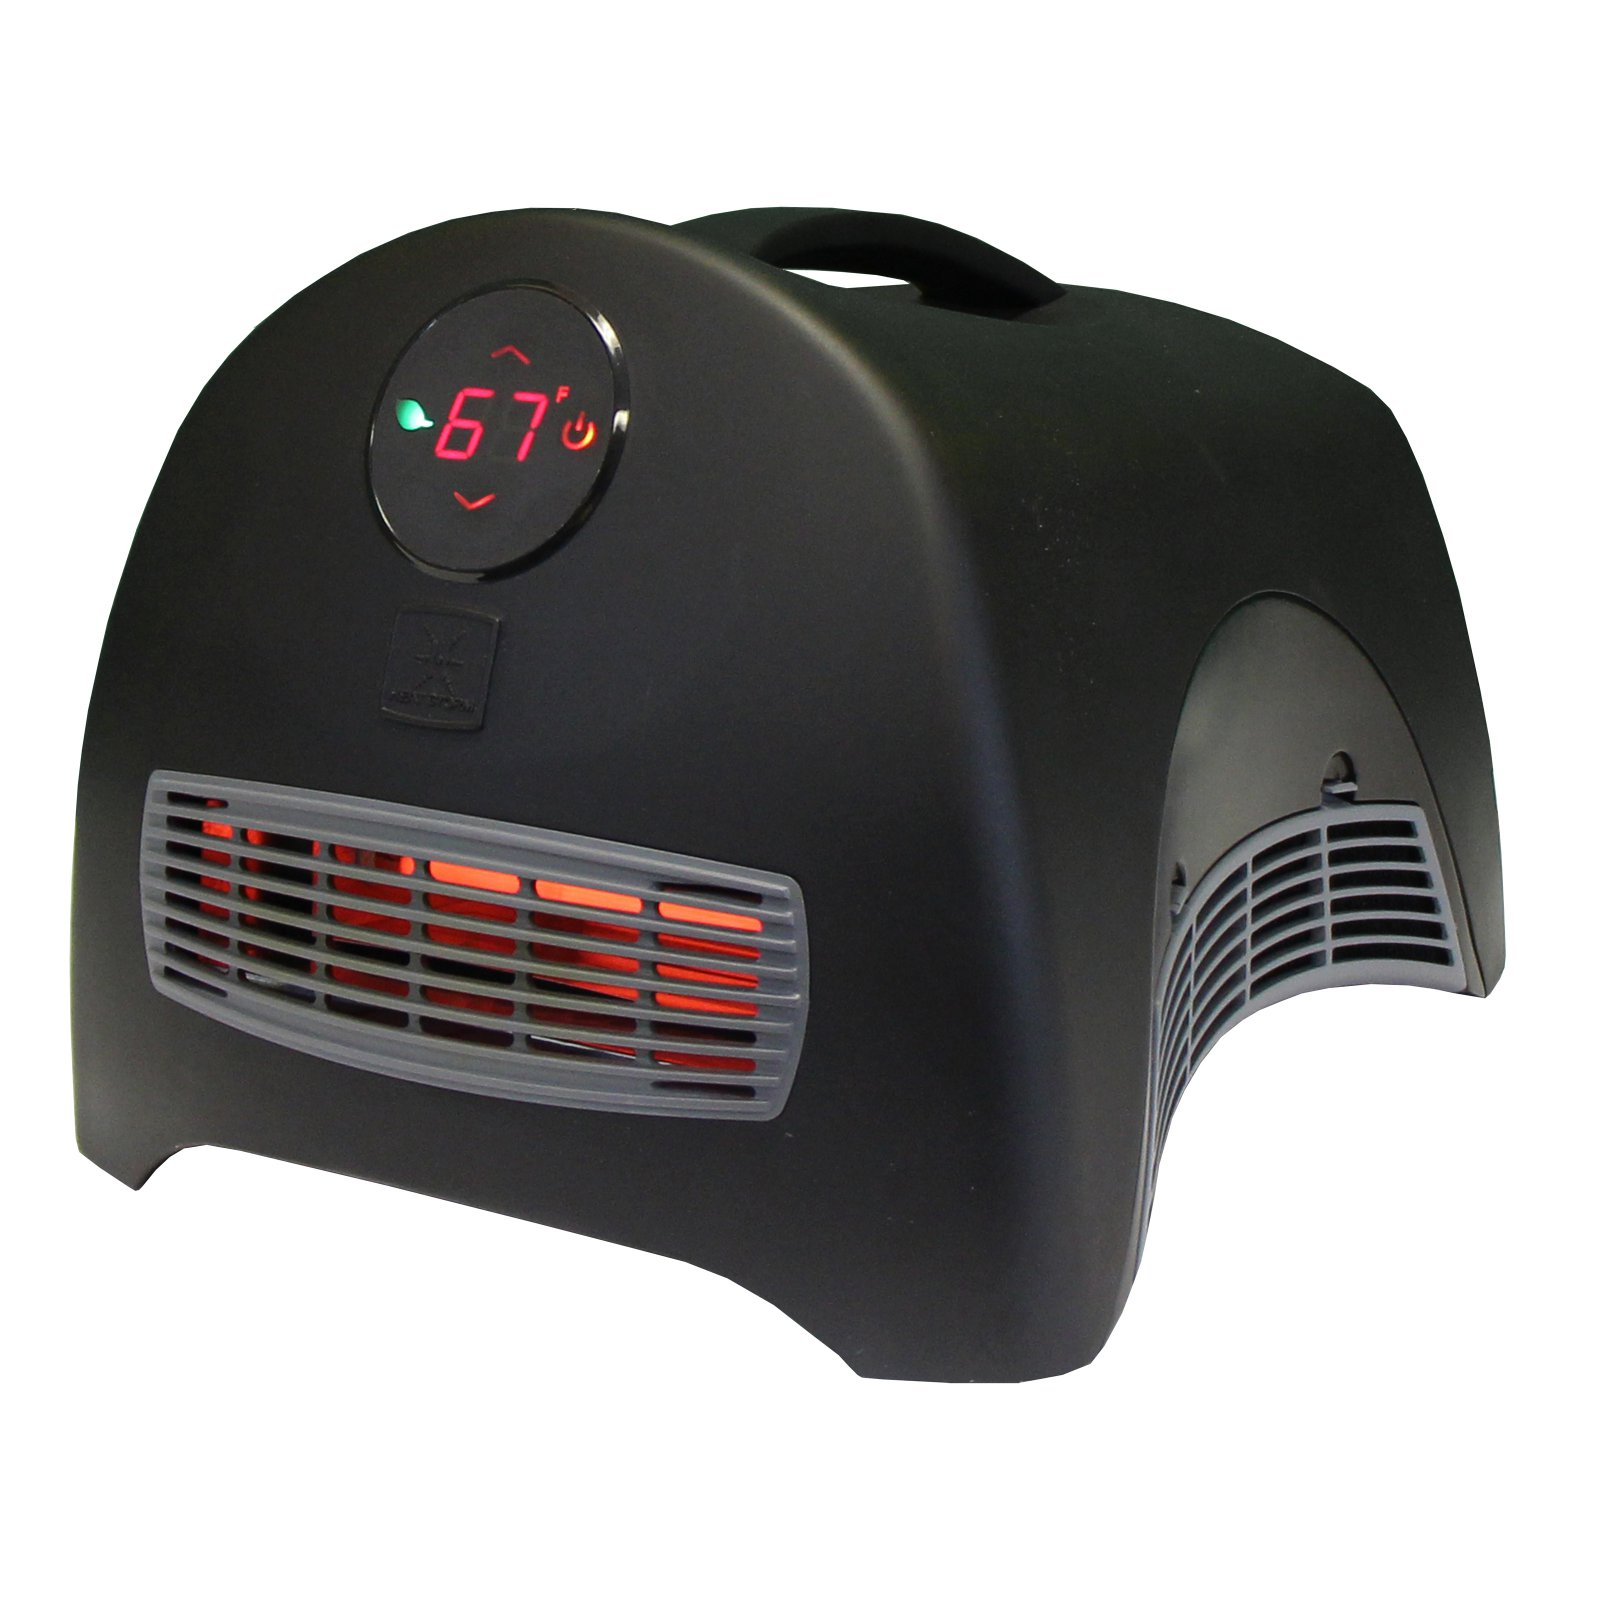 Heat Storm Sahara Portable Infrared Heater